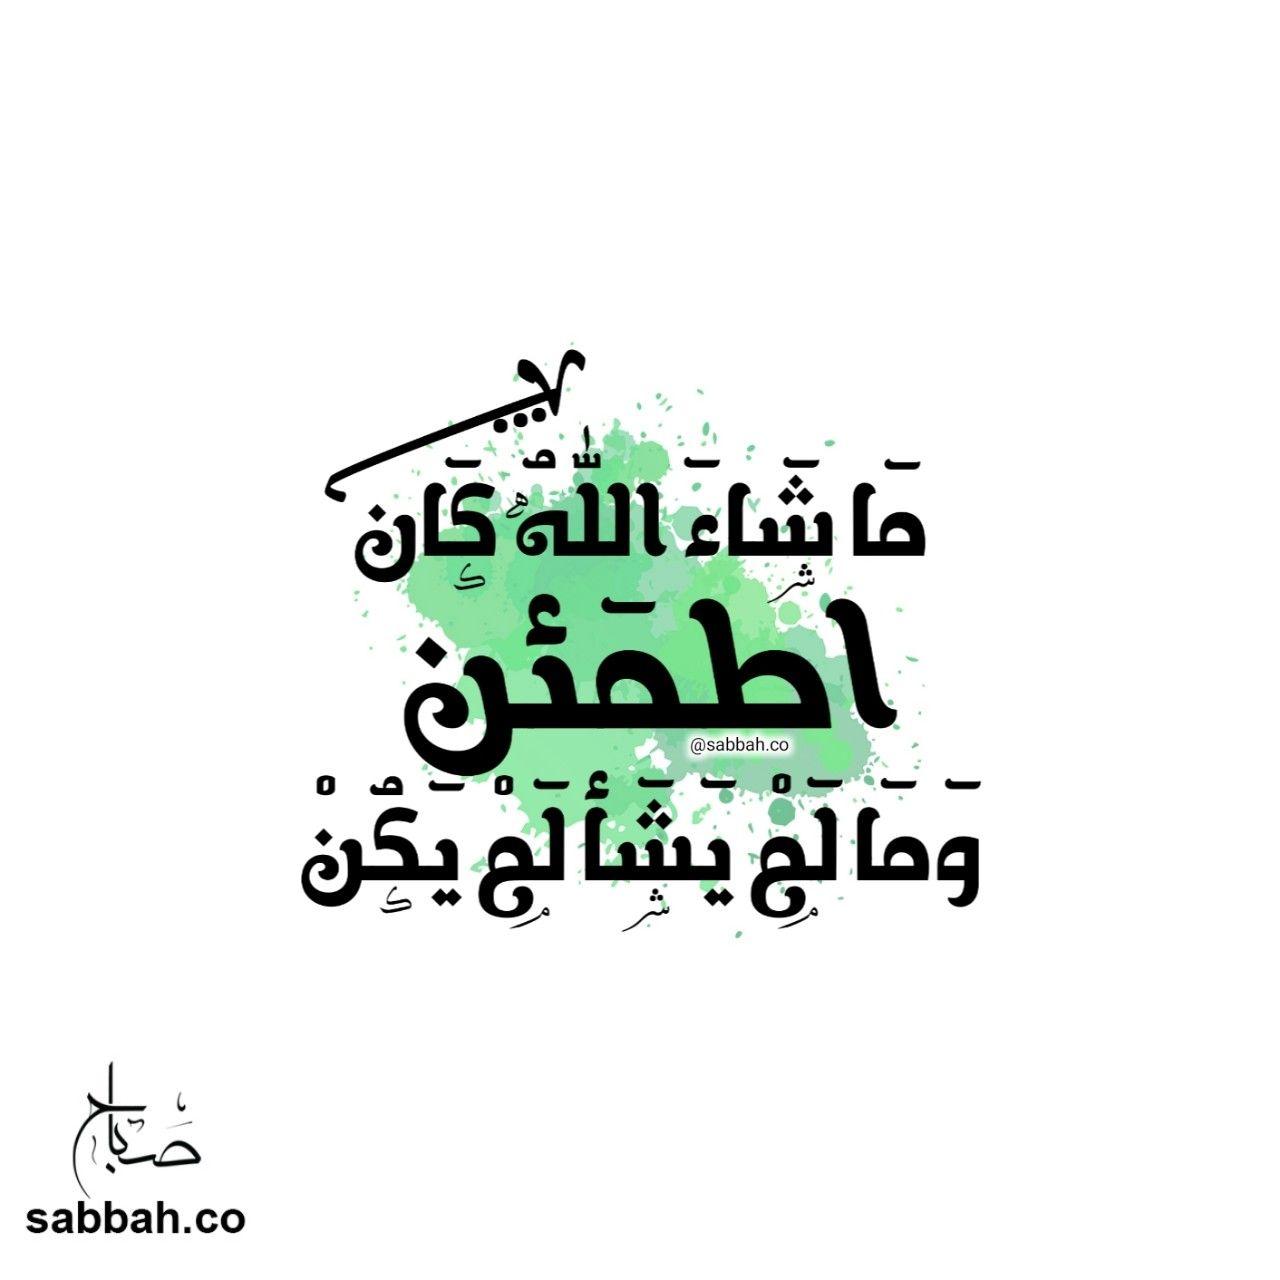 اطمئن ما شاء الله كان وما لم يشأ لم يكن Follow My Instagram Sabbah Co Www Sabbah Co دعاء اذكار ا Philosophical Quotes Islamic Quotes Quotes